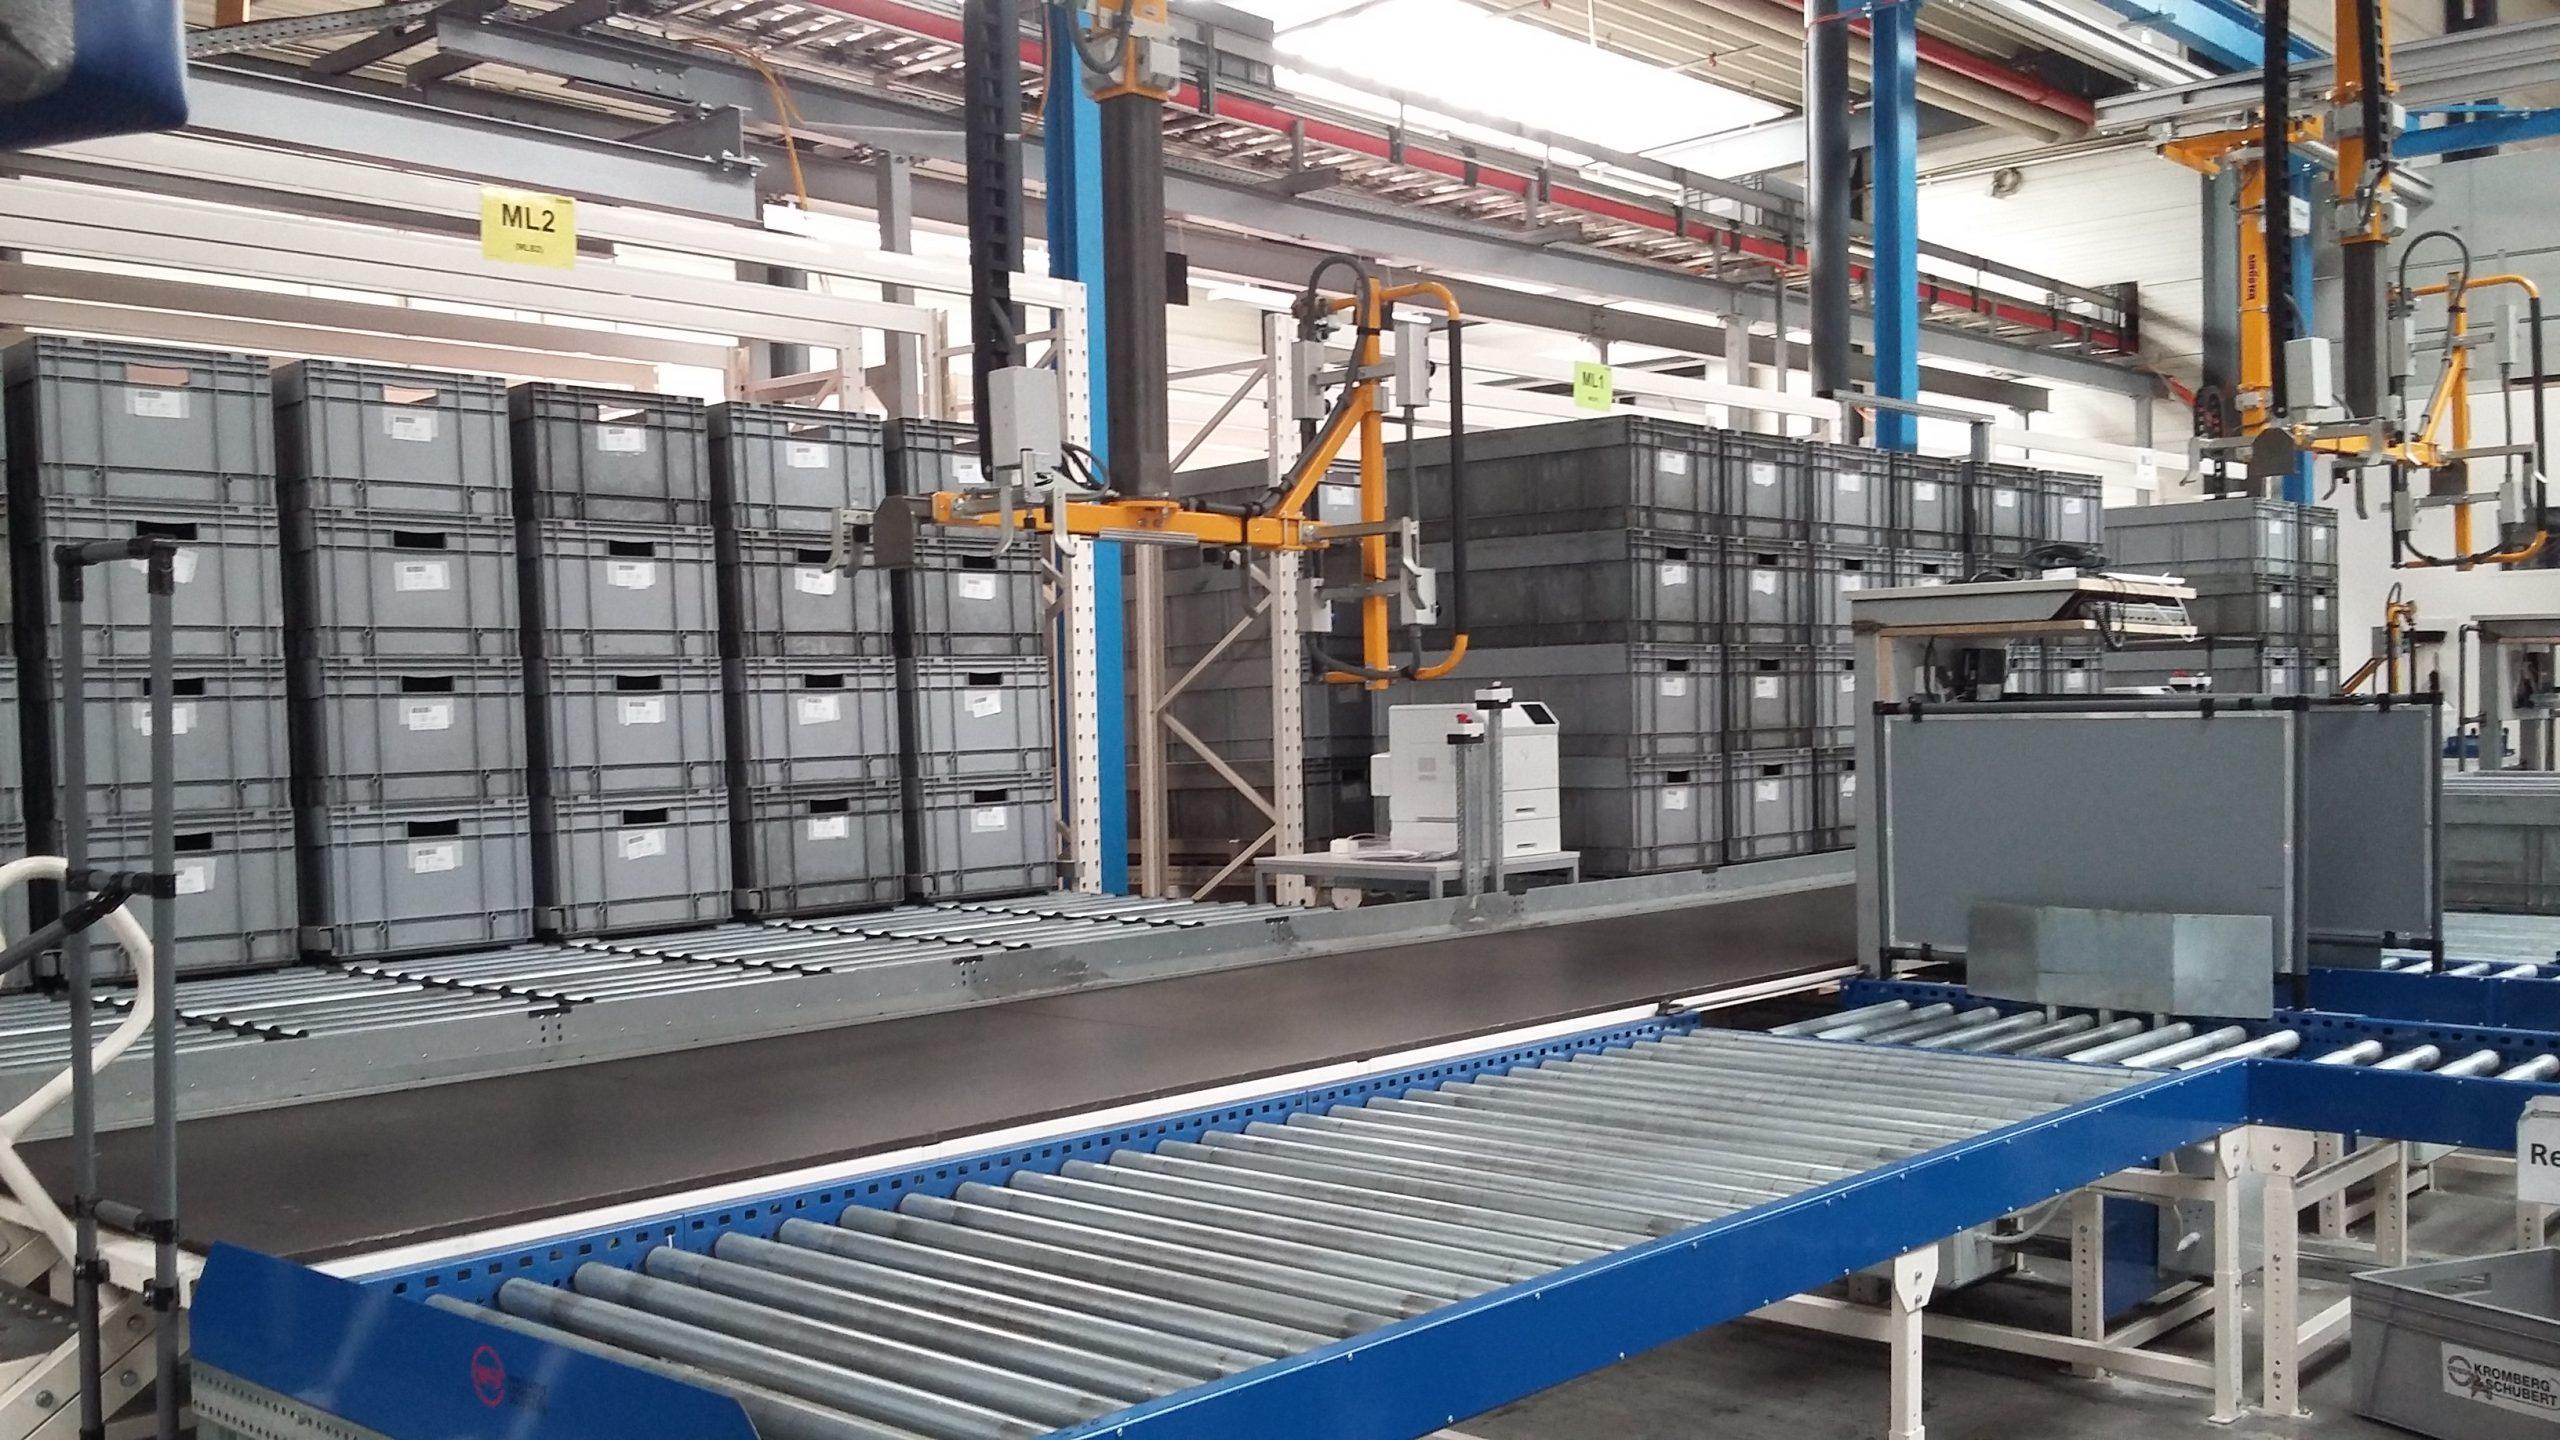 Production warehouse automation for Kromberg&Schubert - 20 - kapelou.com